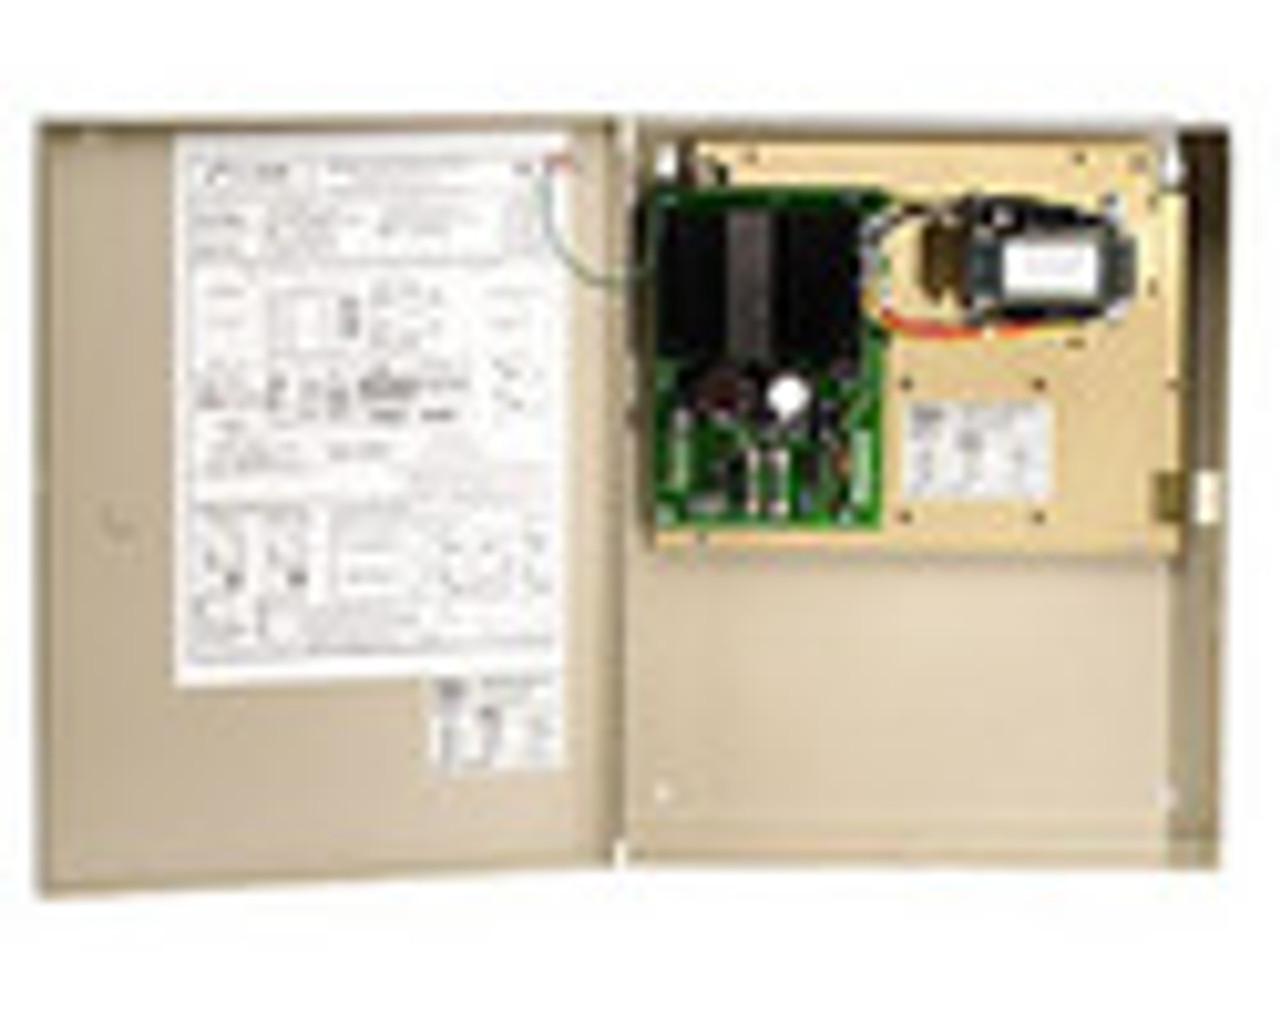 5500-ATS DynaLock Multi Zone Medium Duty Power Supply with Anti-Tamper Switch